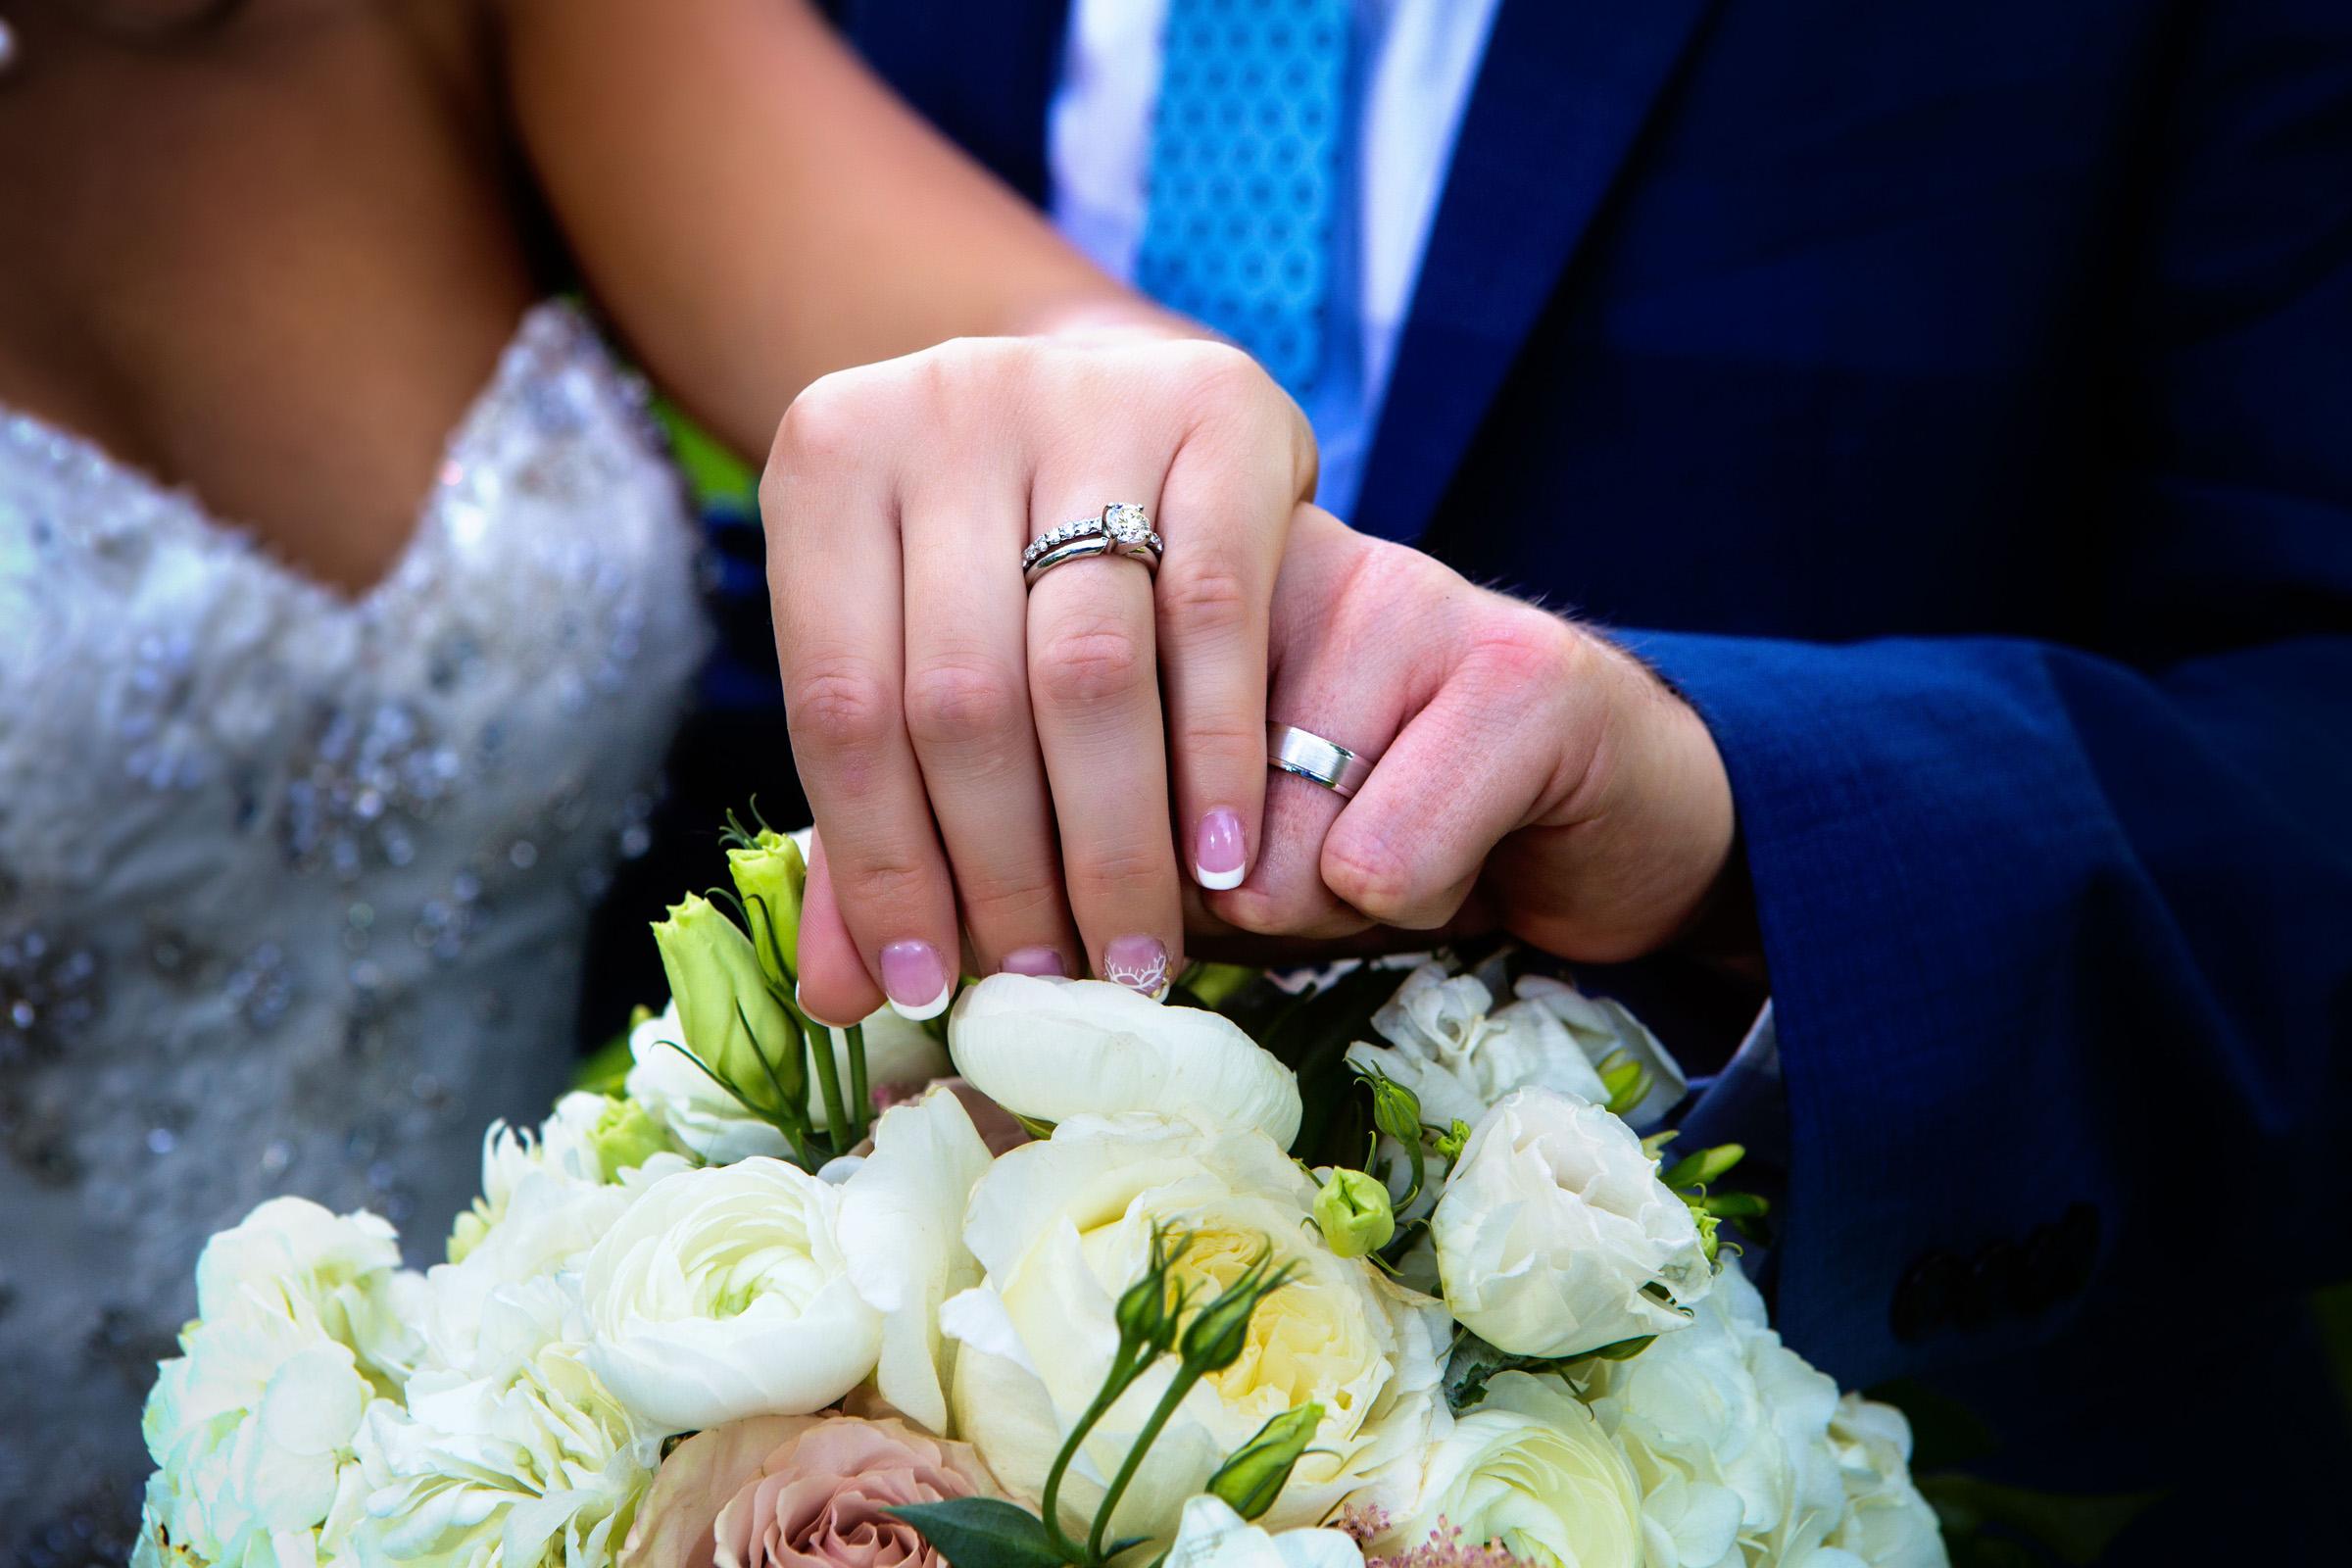 wedding rings over flowers